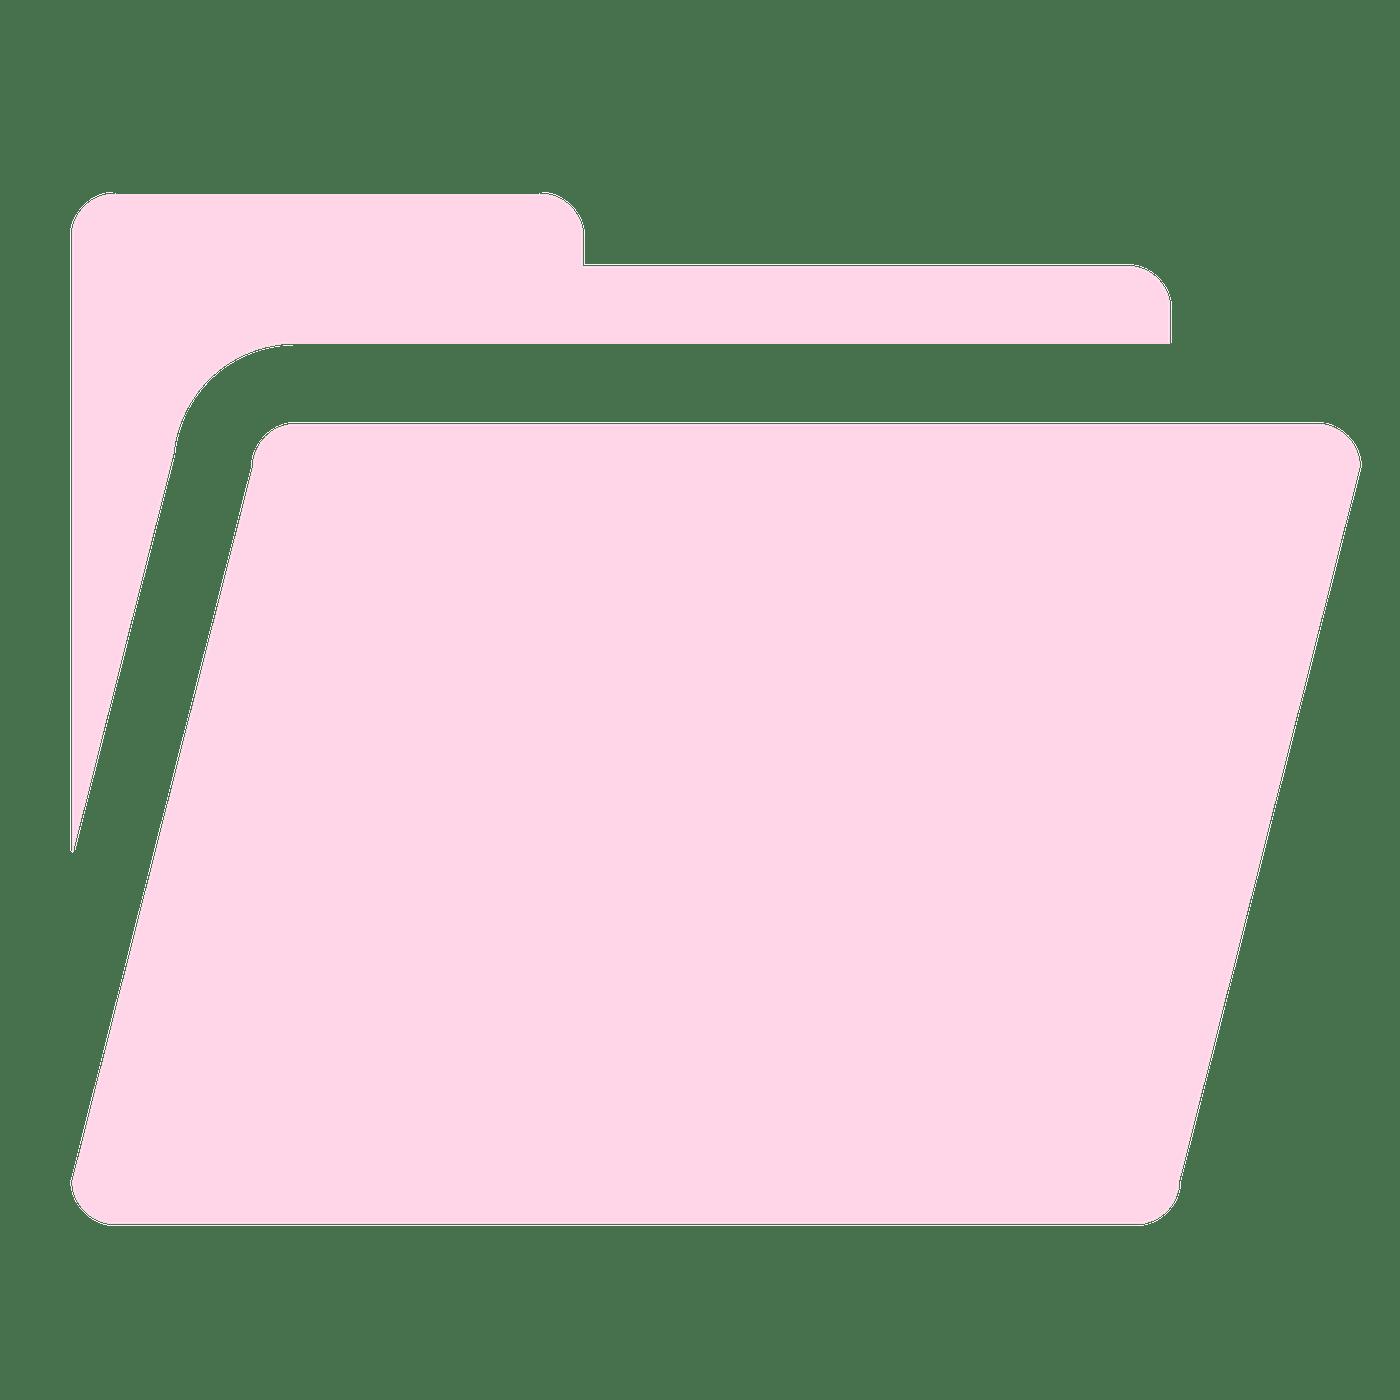 Pink Folder Blank